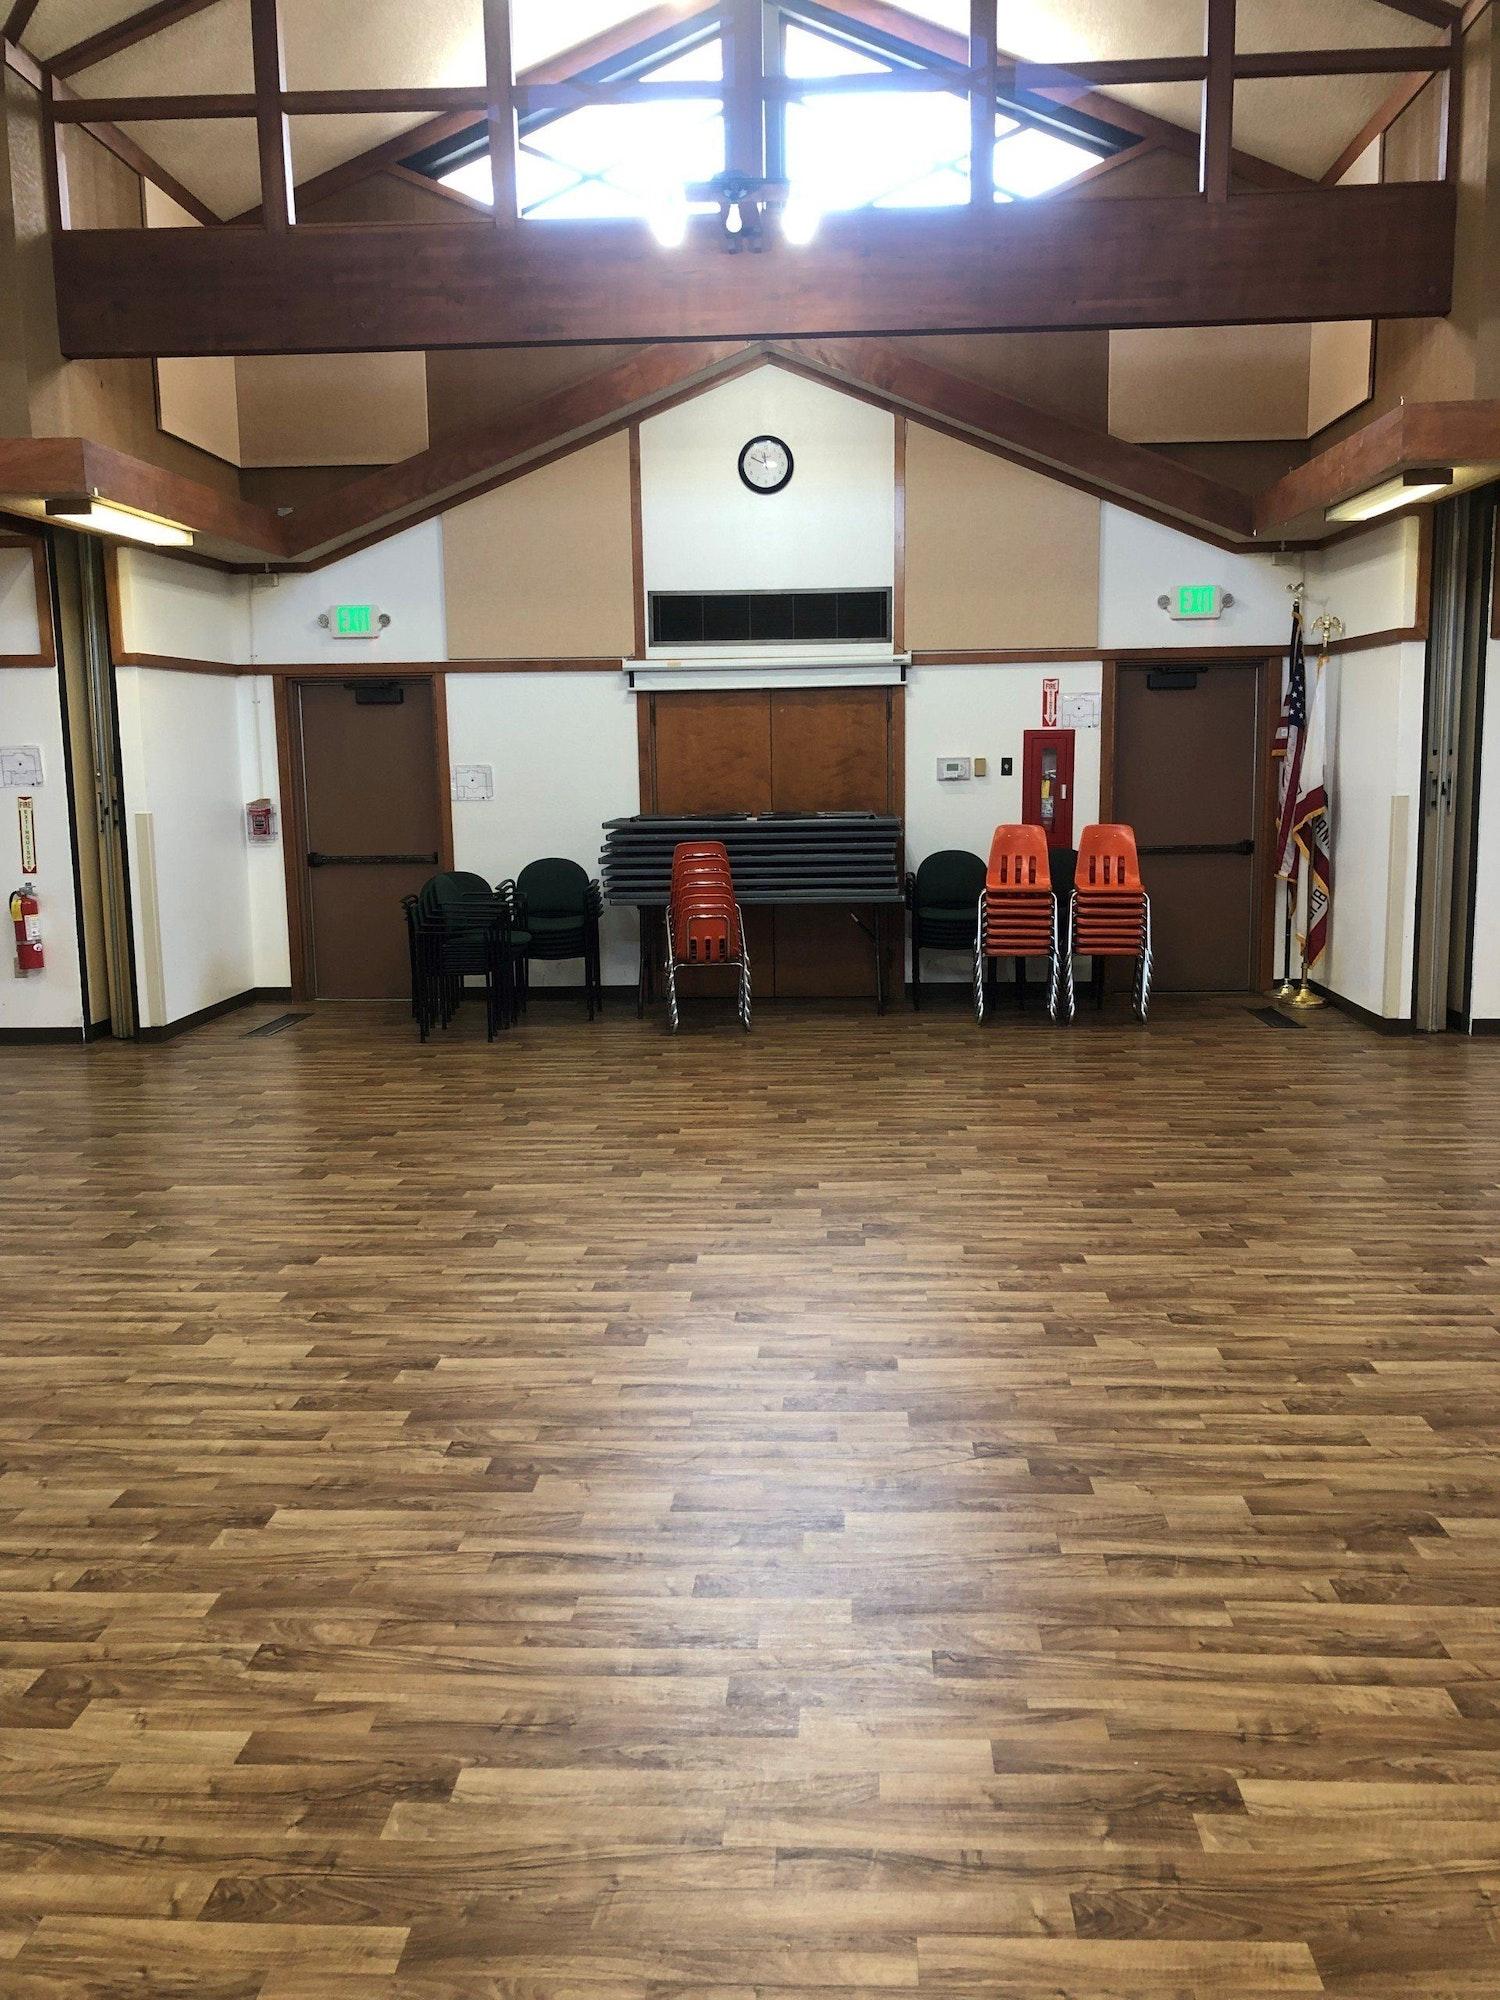 May contain: flooring, floor, furniture, chair, wood, hardwood, room, indoors, and rug